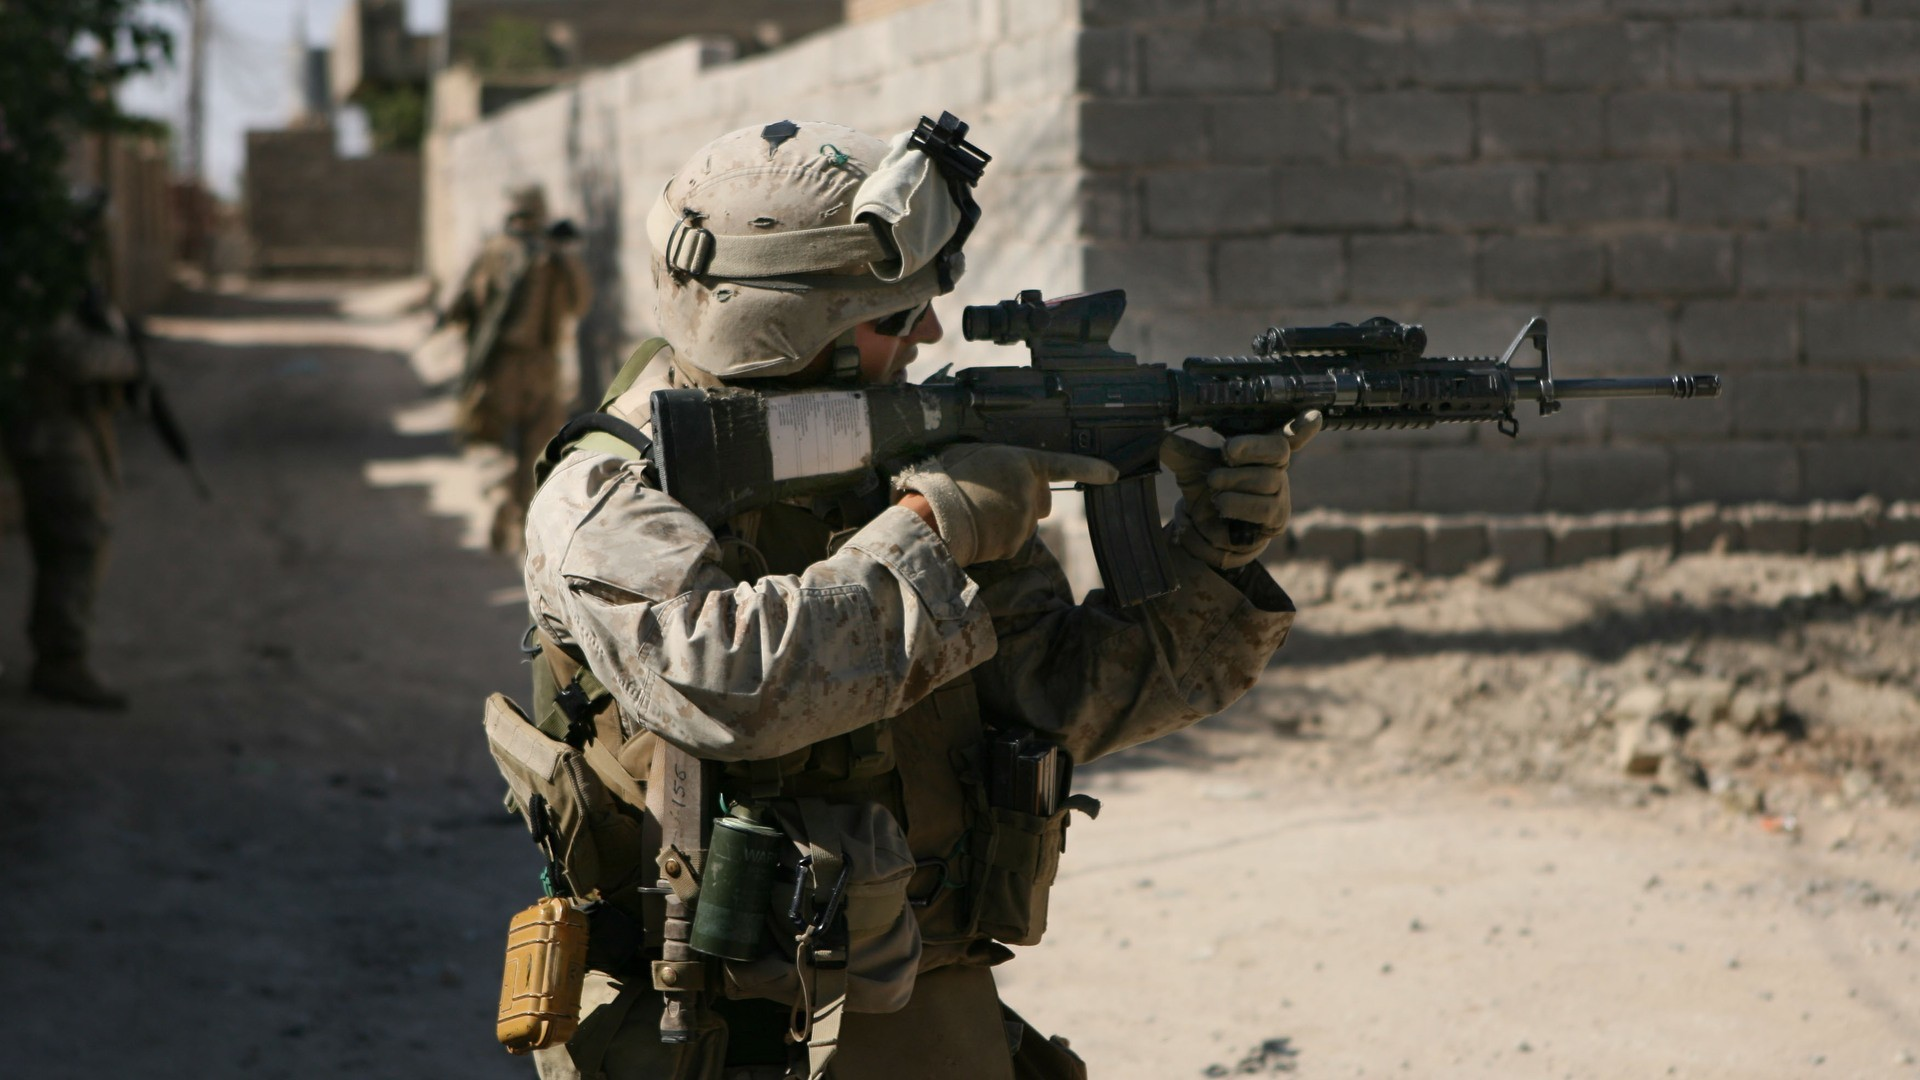 1920x1080 Guns US Marines Corps M16A4 ACOG Desktop And Mobile Wallpaper